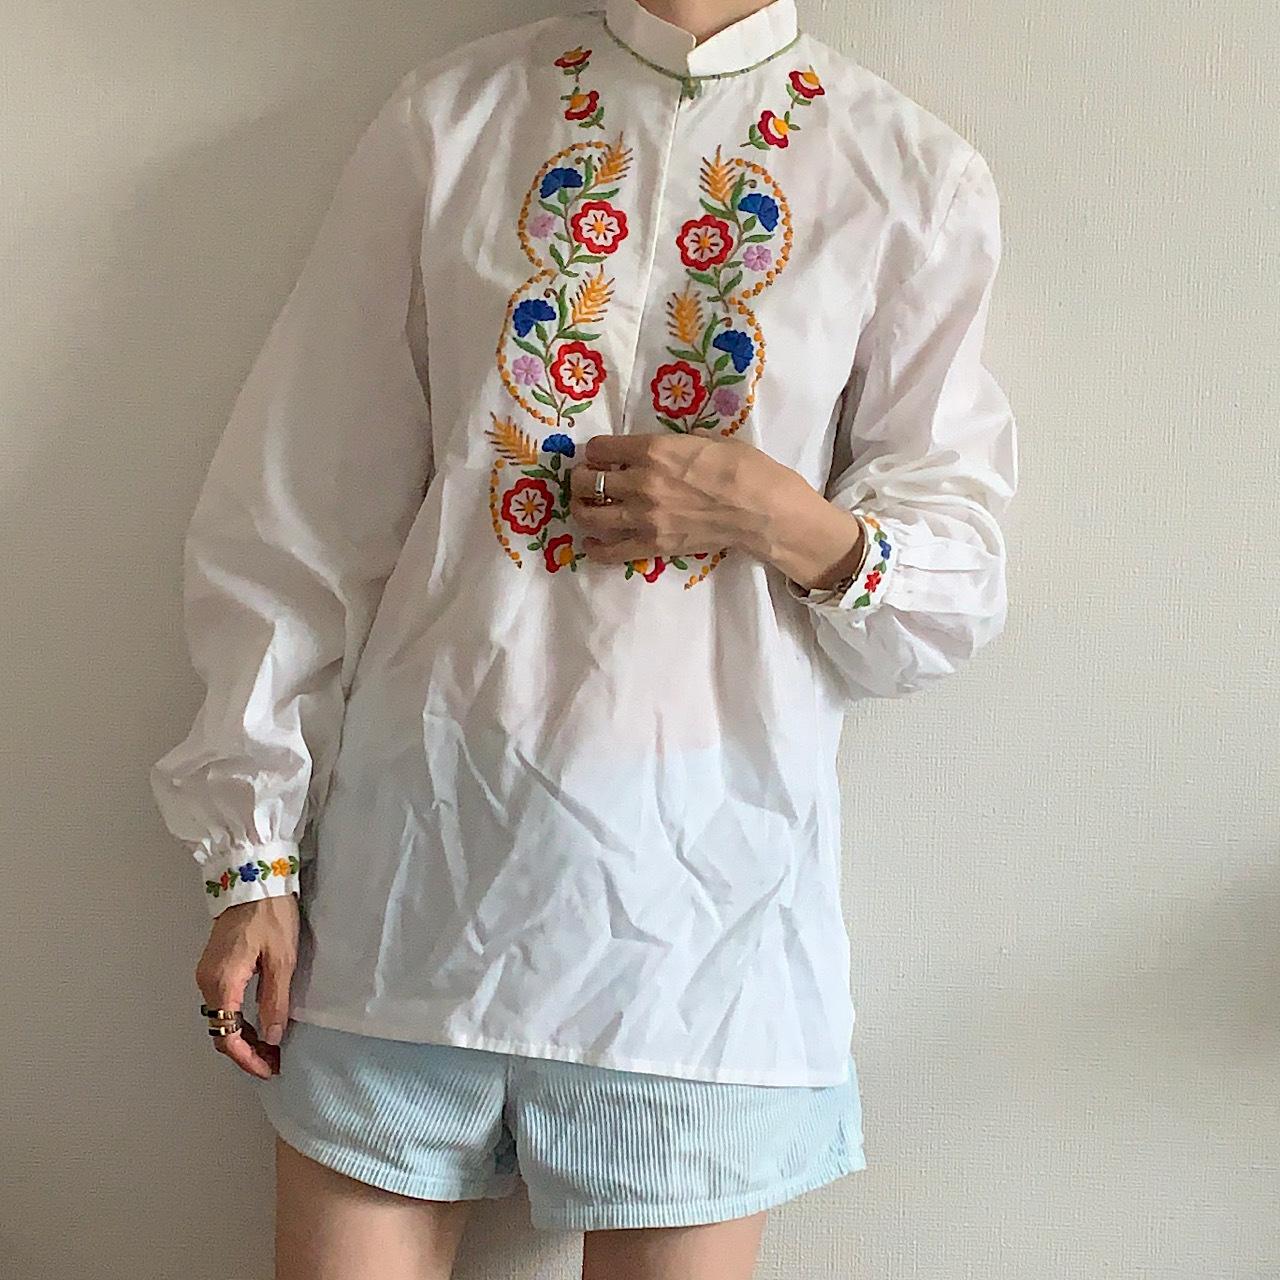 70's-80's Caftan blouse